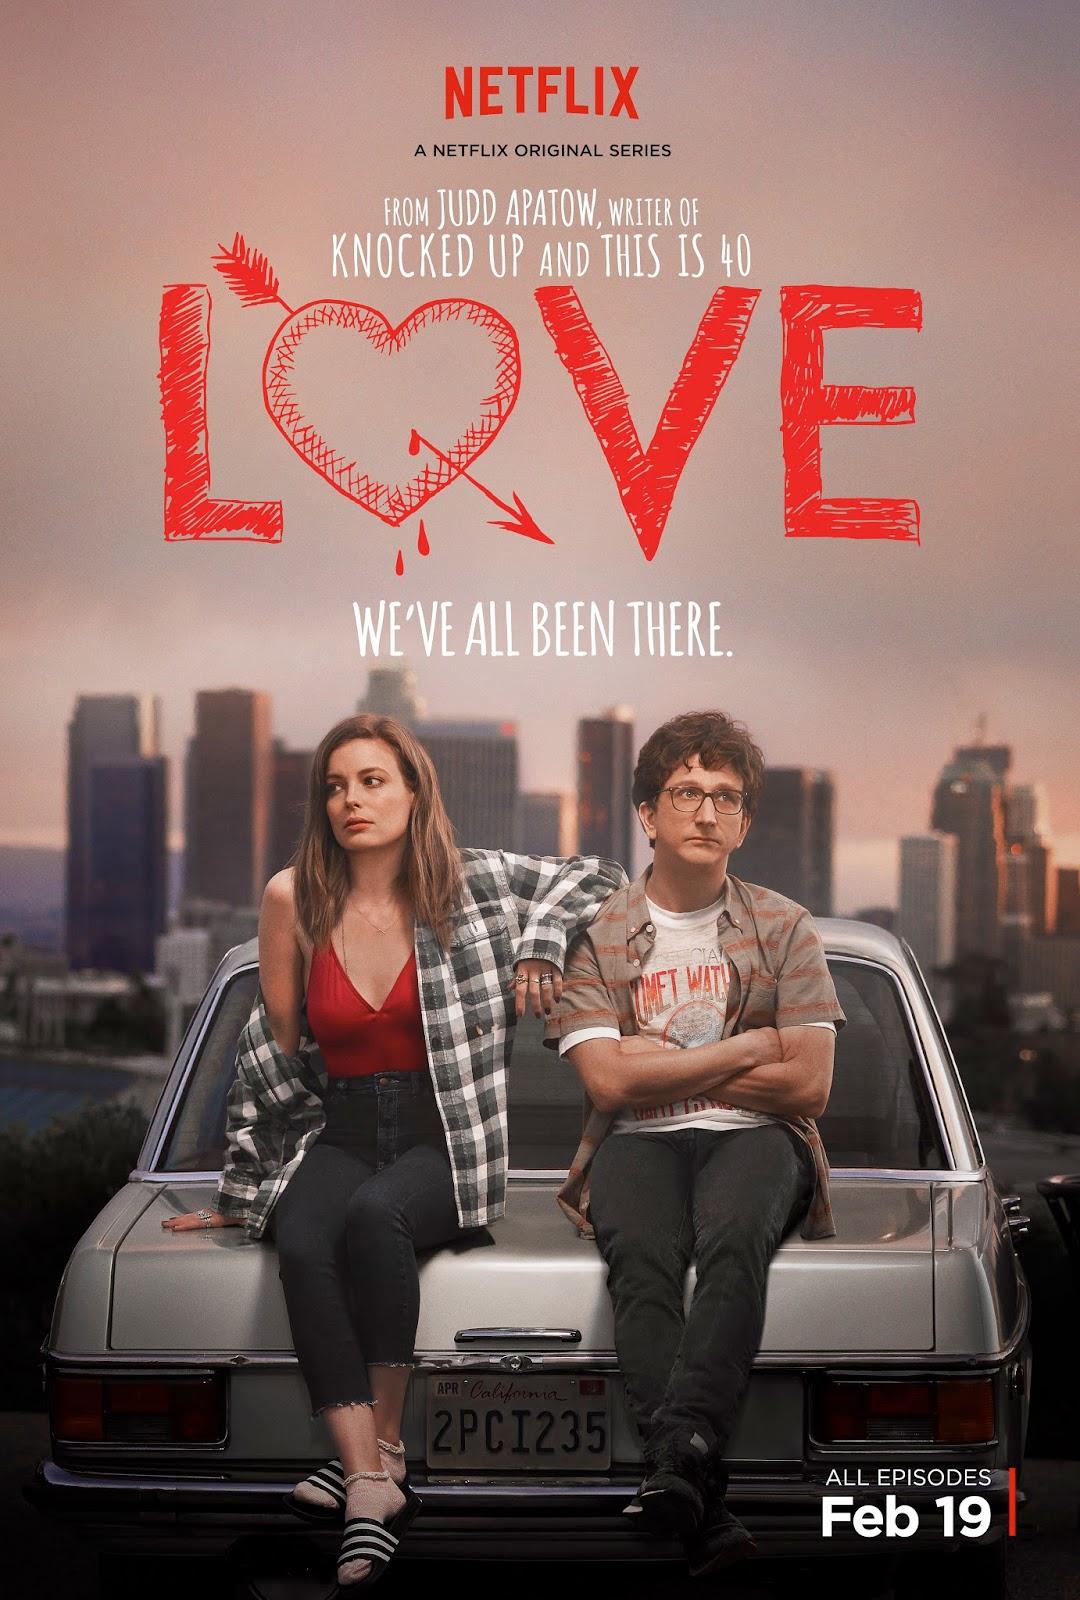 Lo mejor de Netflix